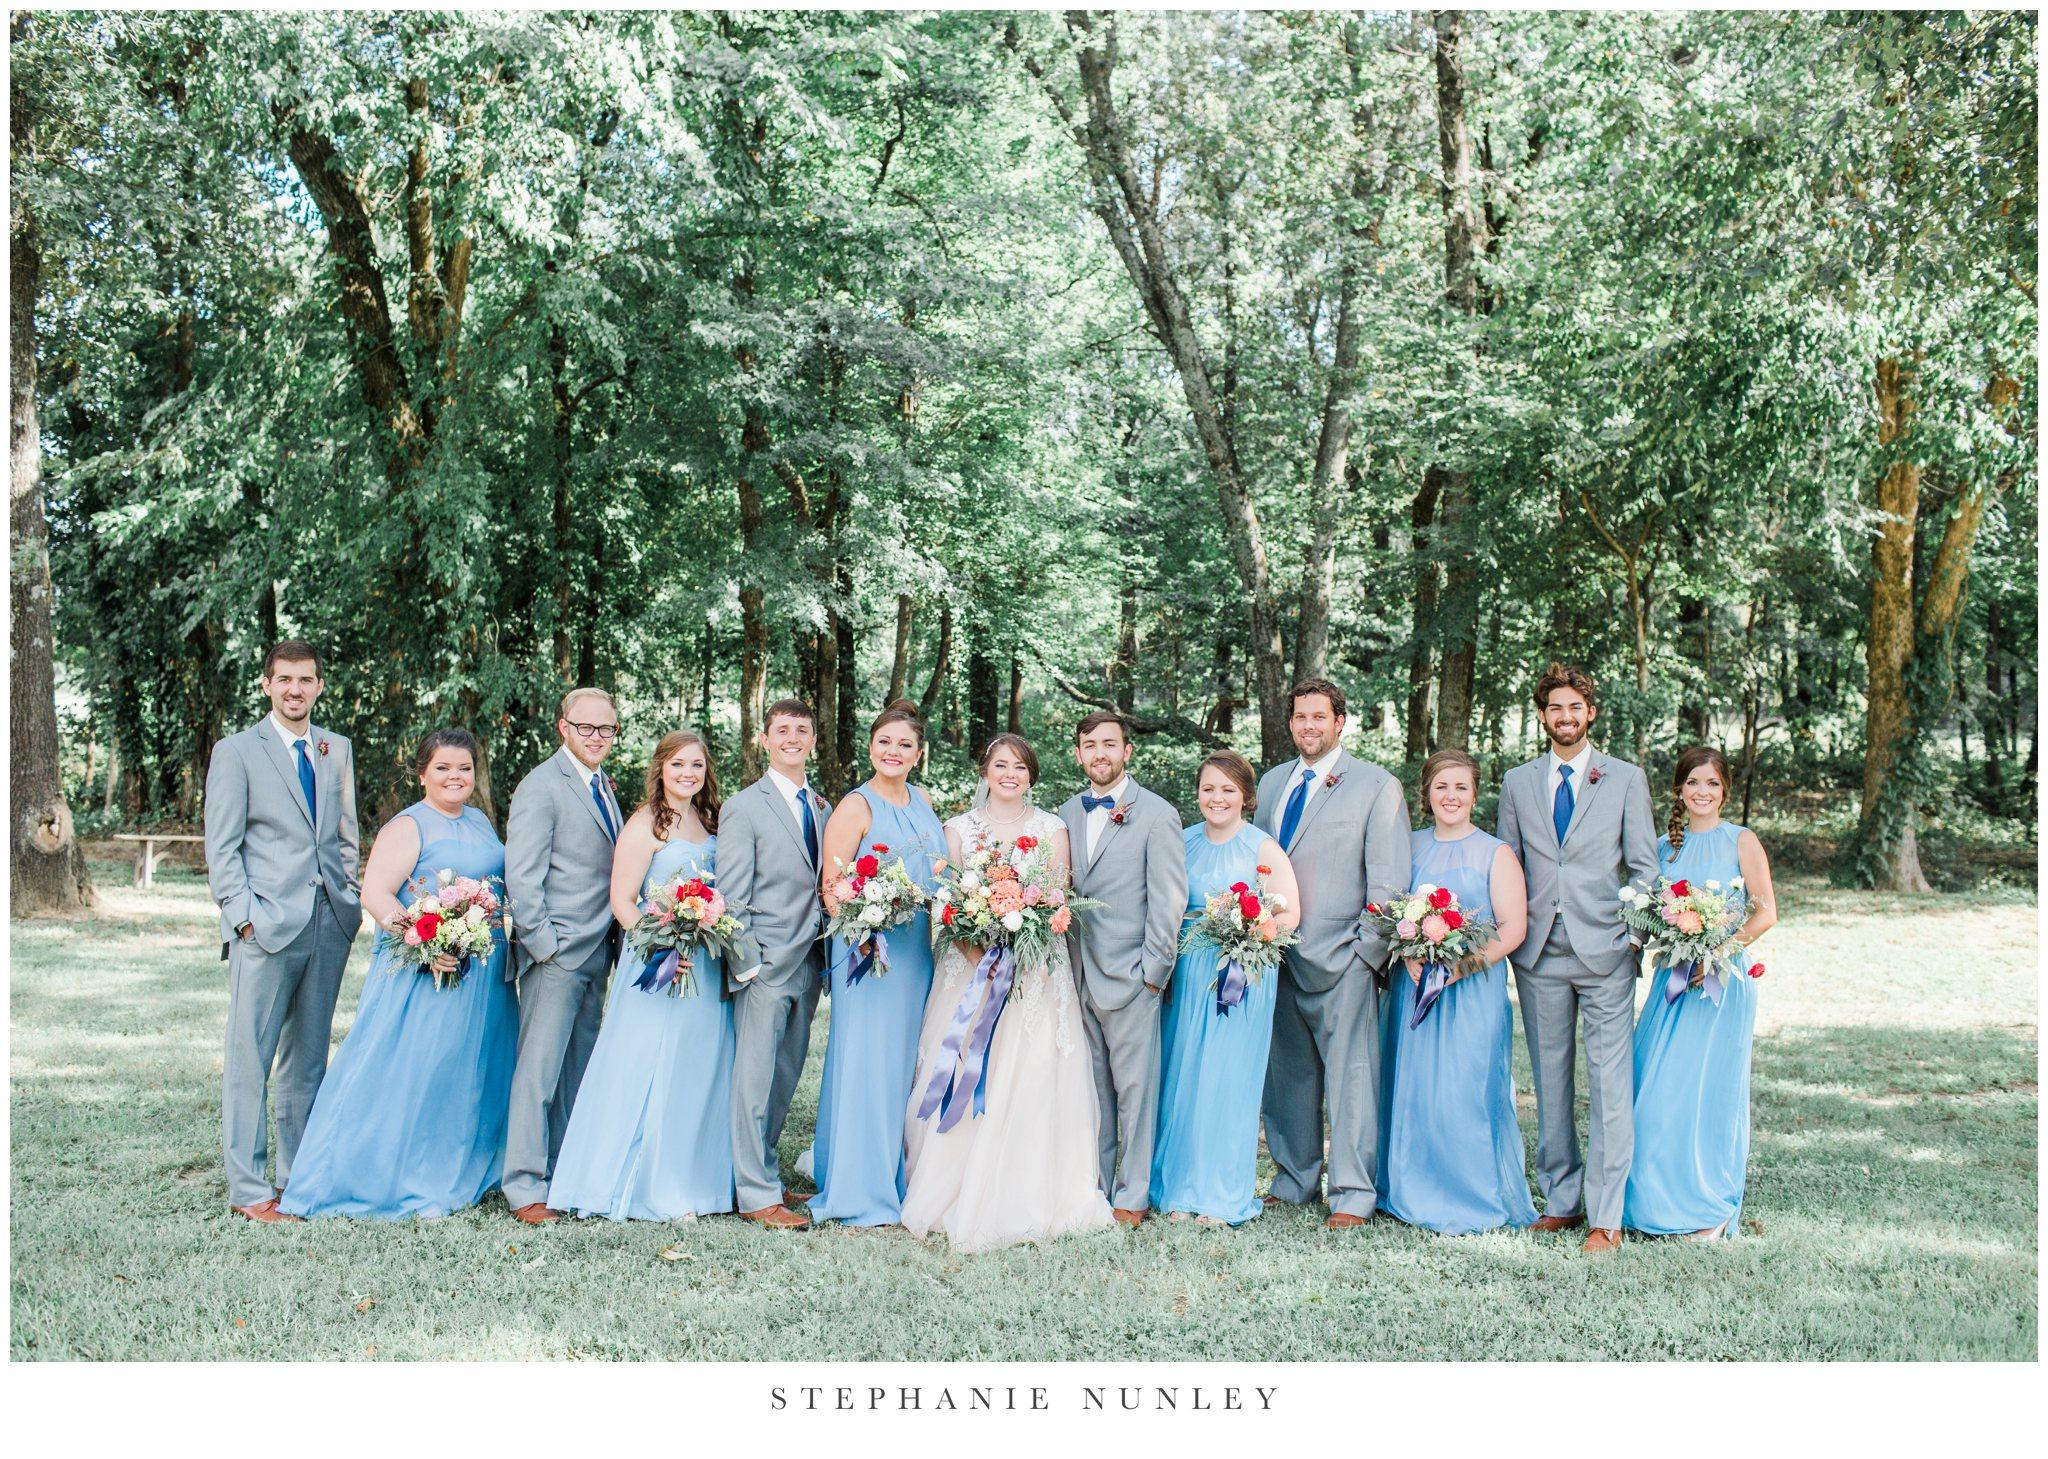 arkansas-wedding-with-lush-wildflower-bouquet-0072.jpg